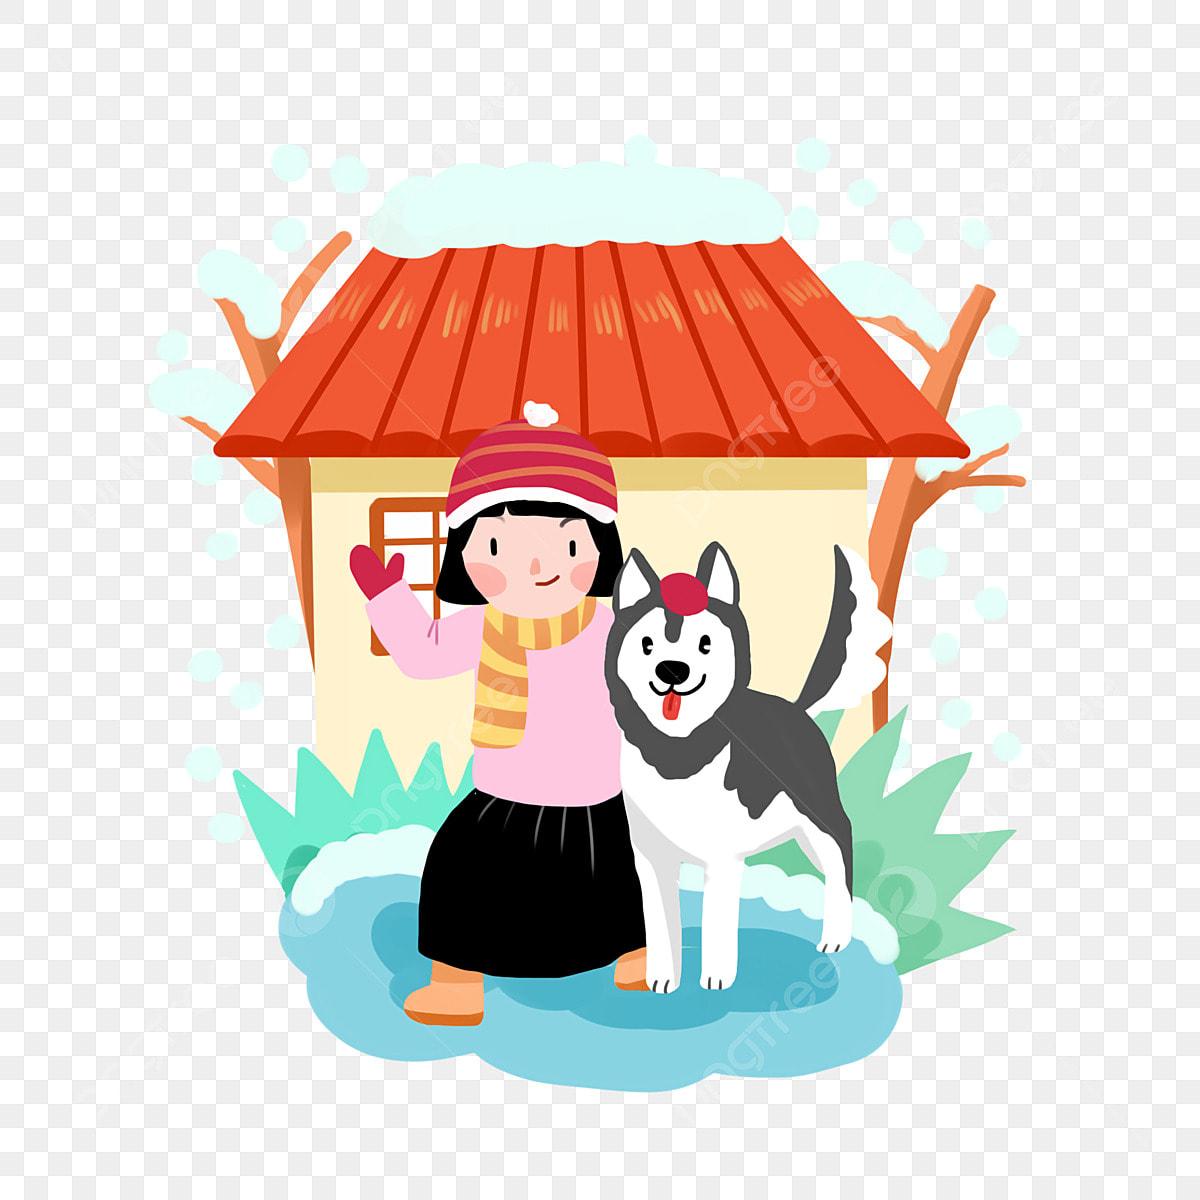 Boston Terrier Drawing Images, Stock Photos & Vectors | Shutterstock